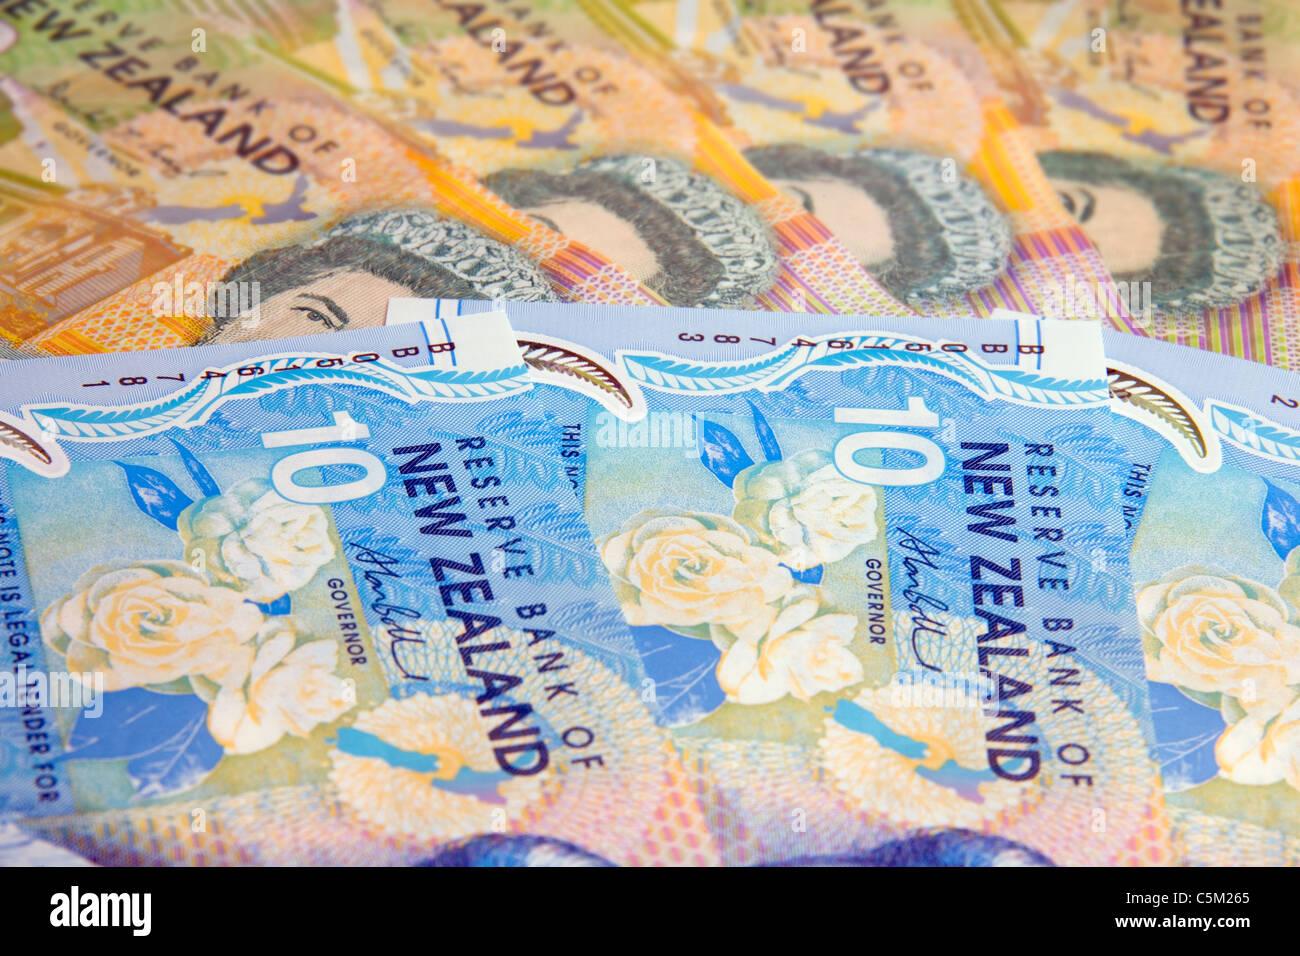 New Zealand currency, dollars, tens and twenties - Stock Image